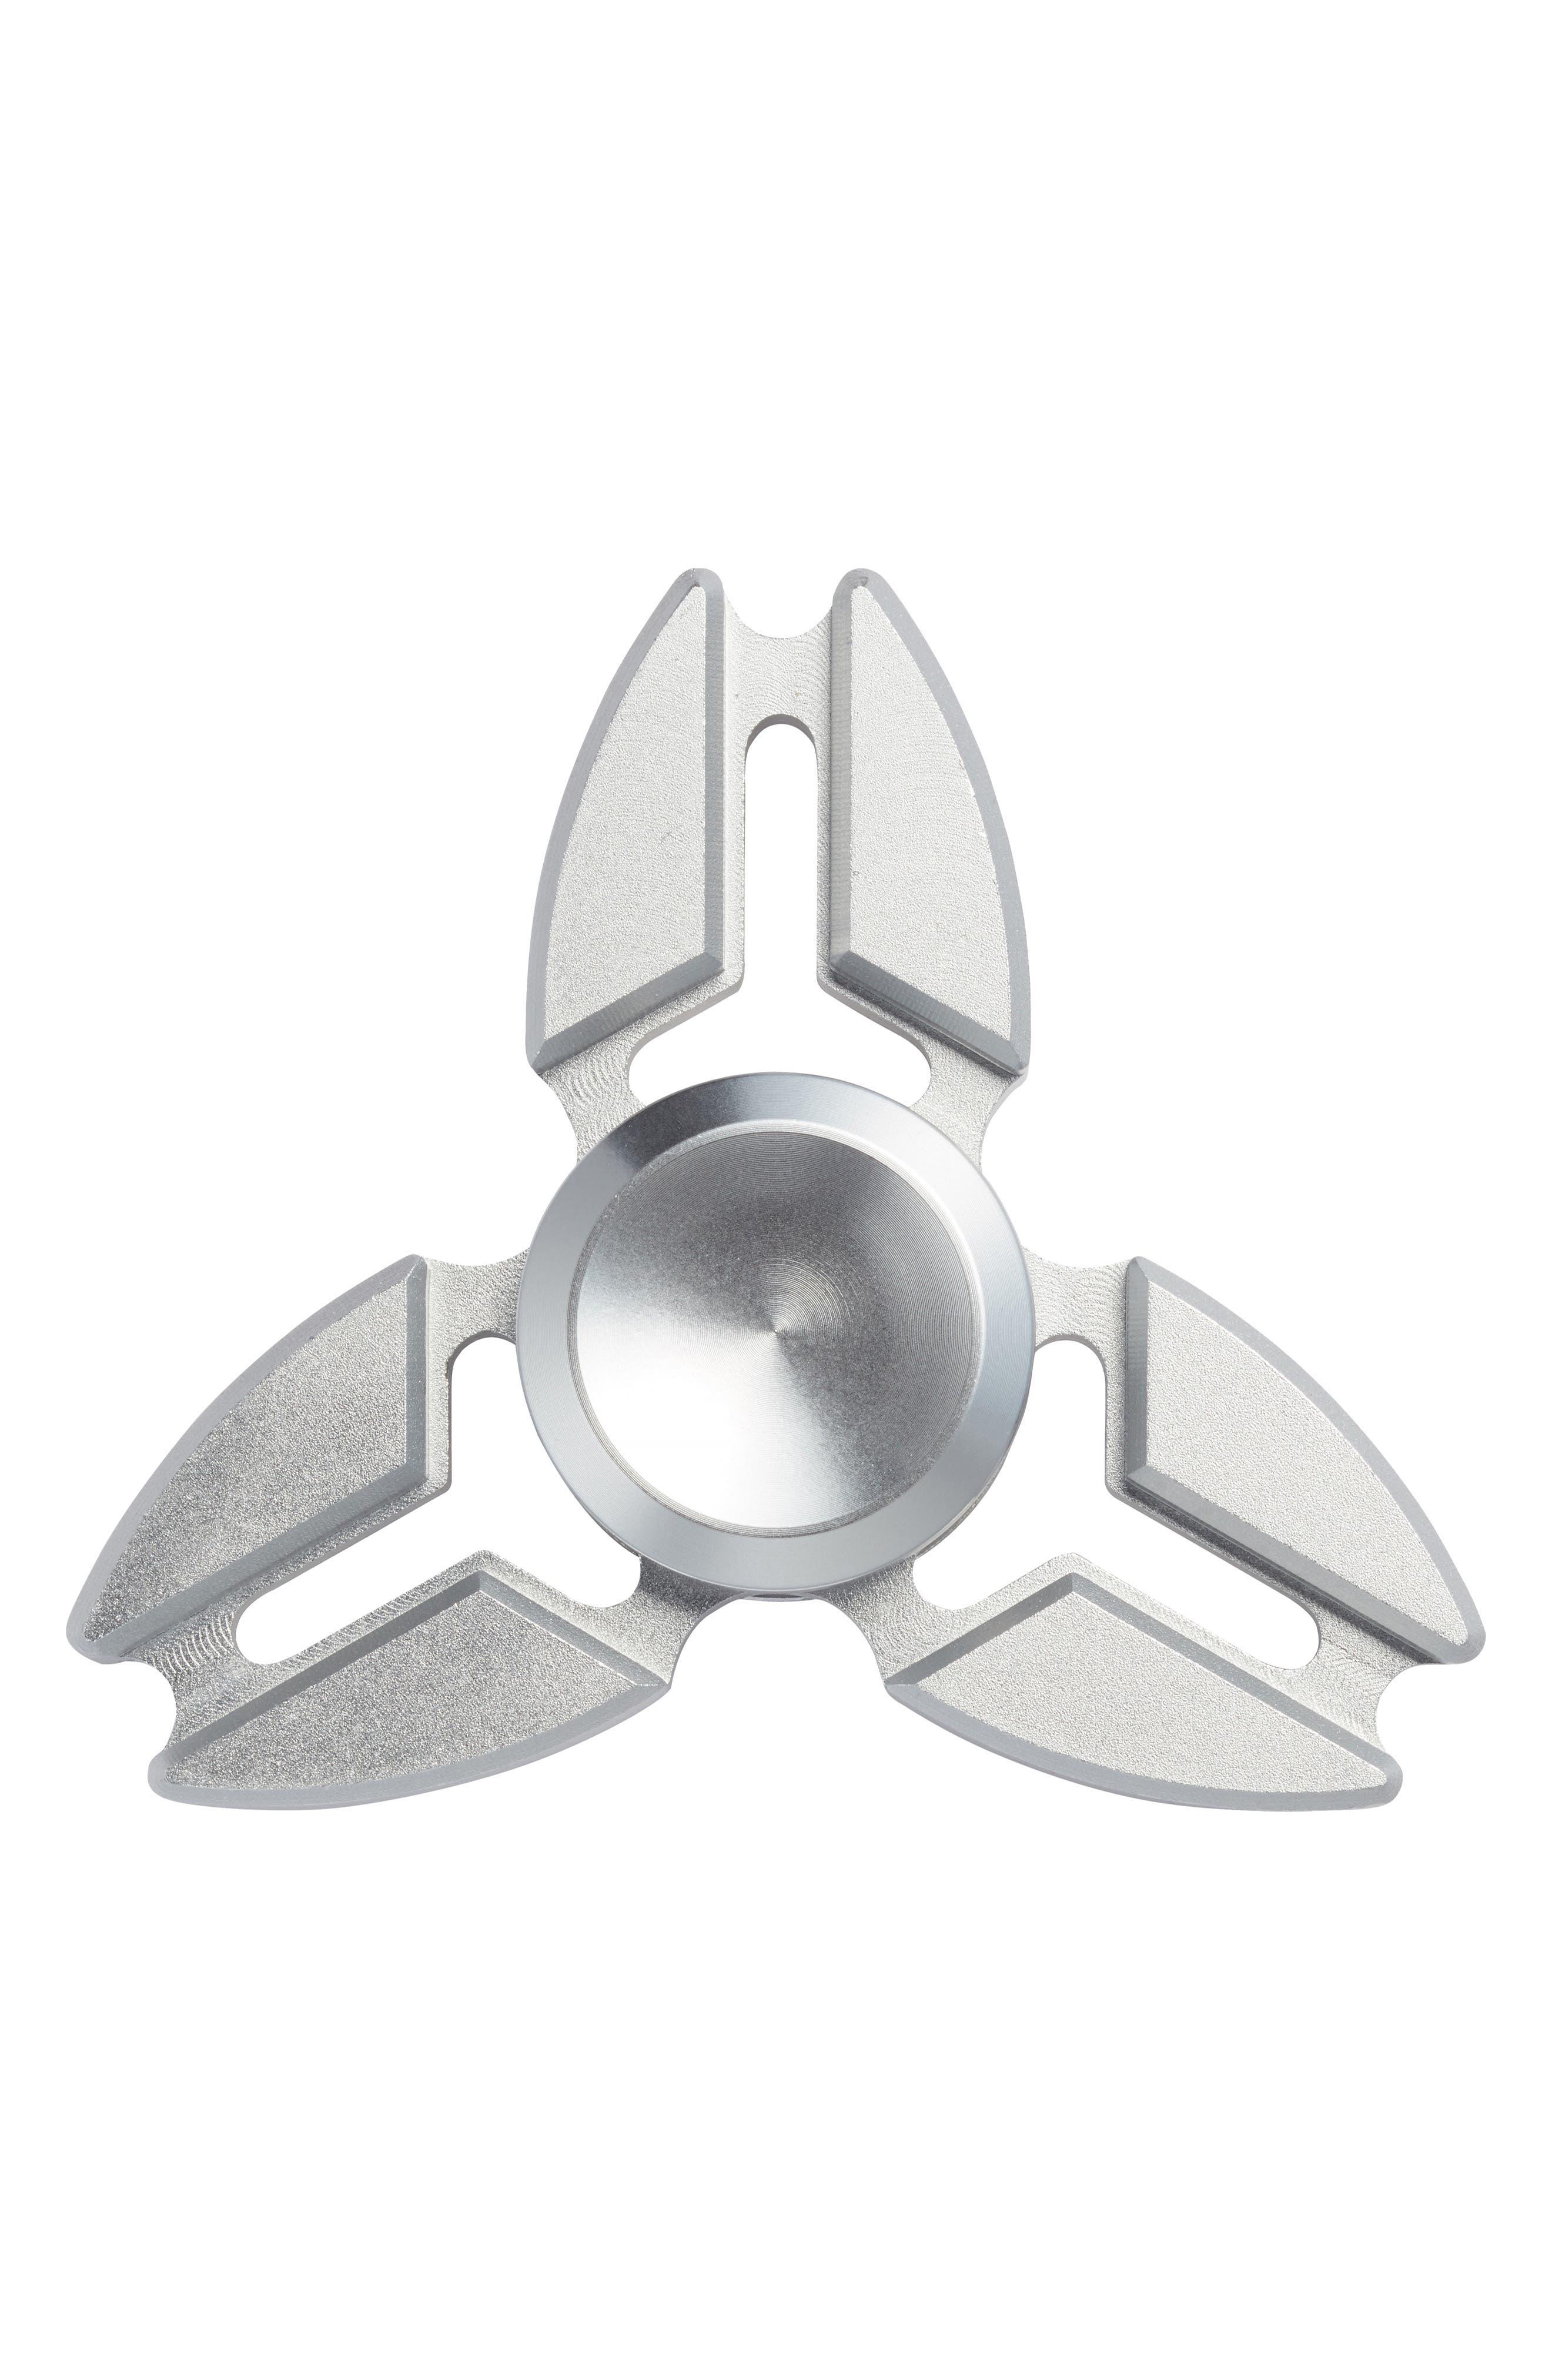 Main Image - Addictive Fidget Toys Coulee Tri Bar Fidget Spinner